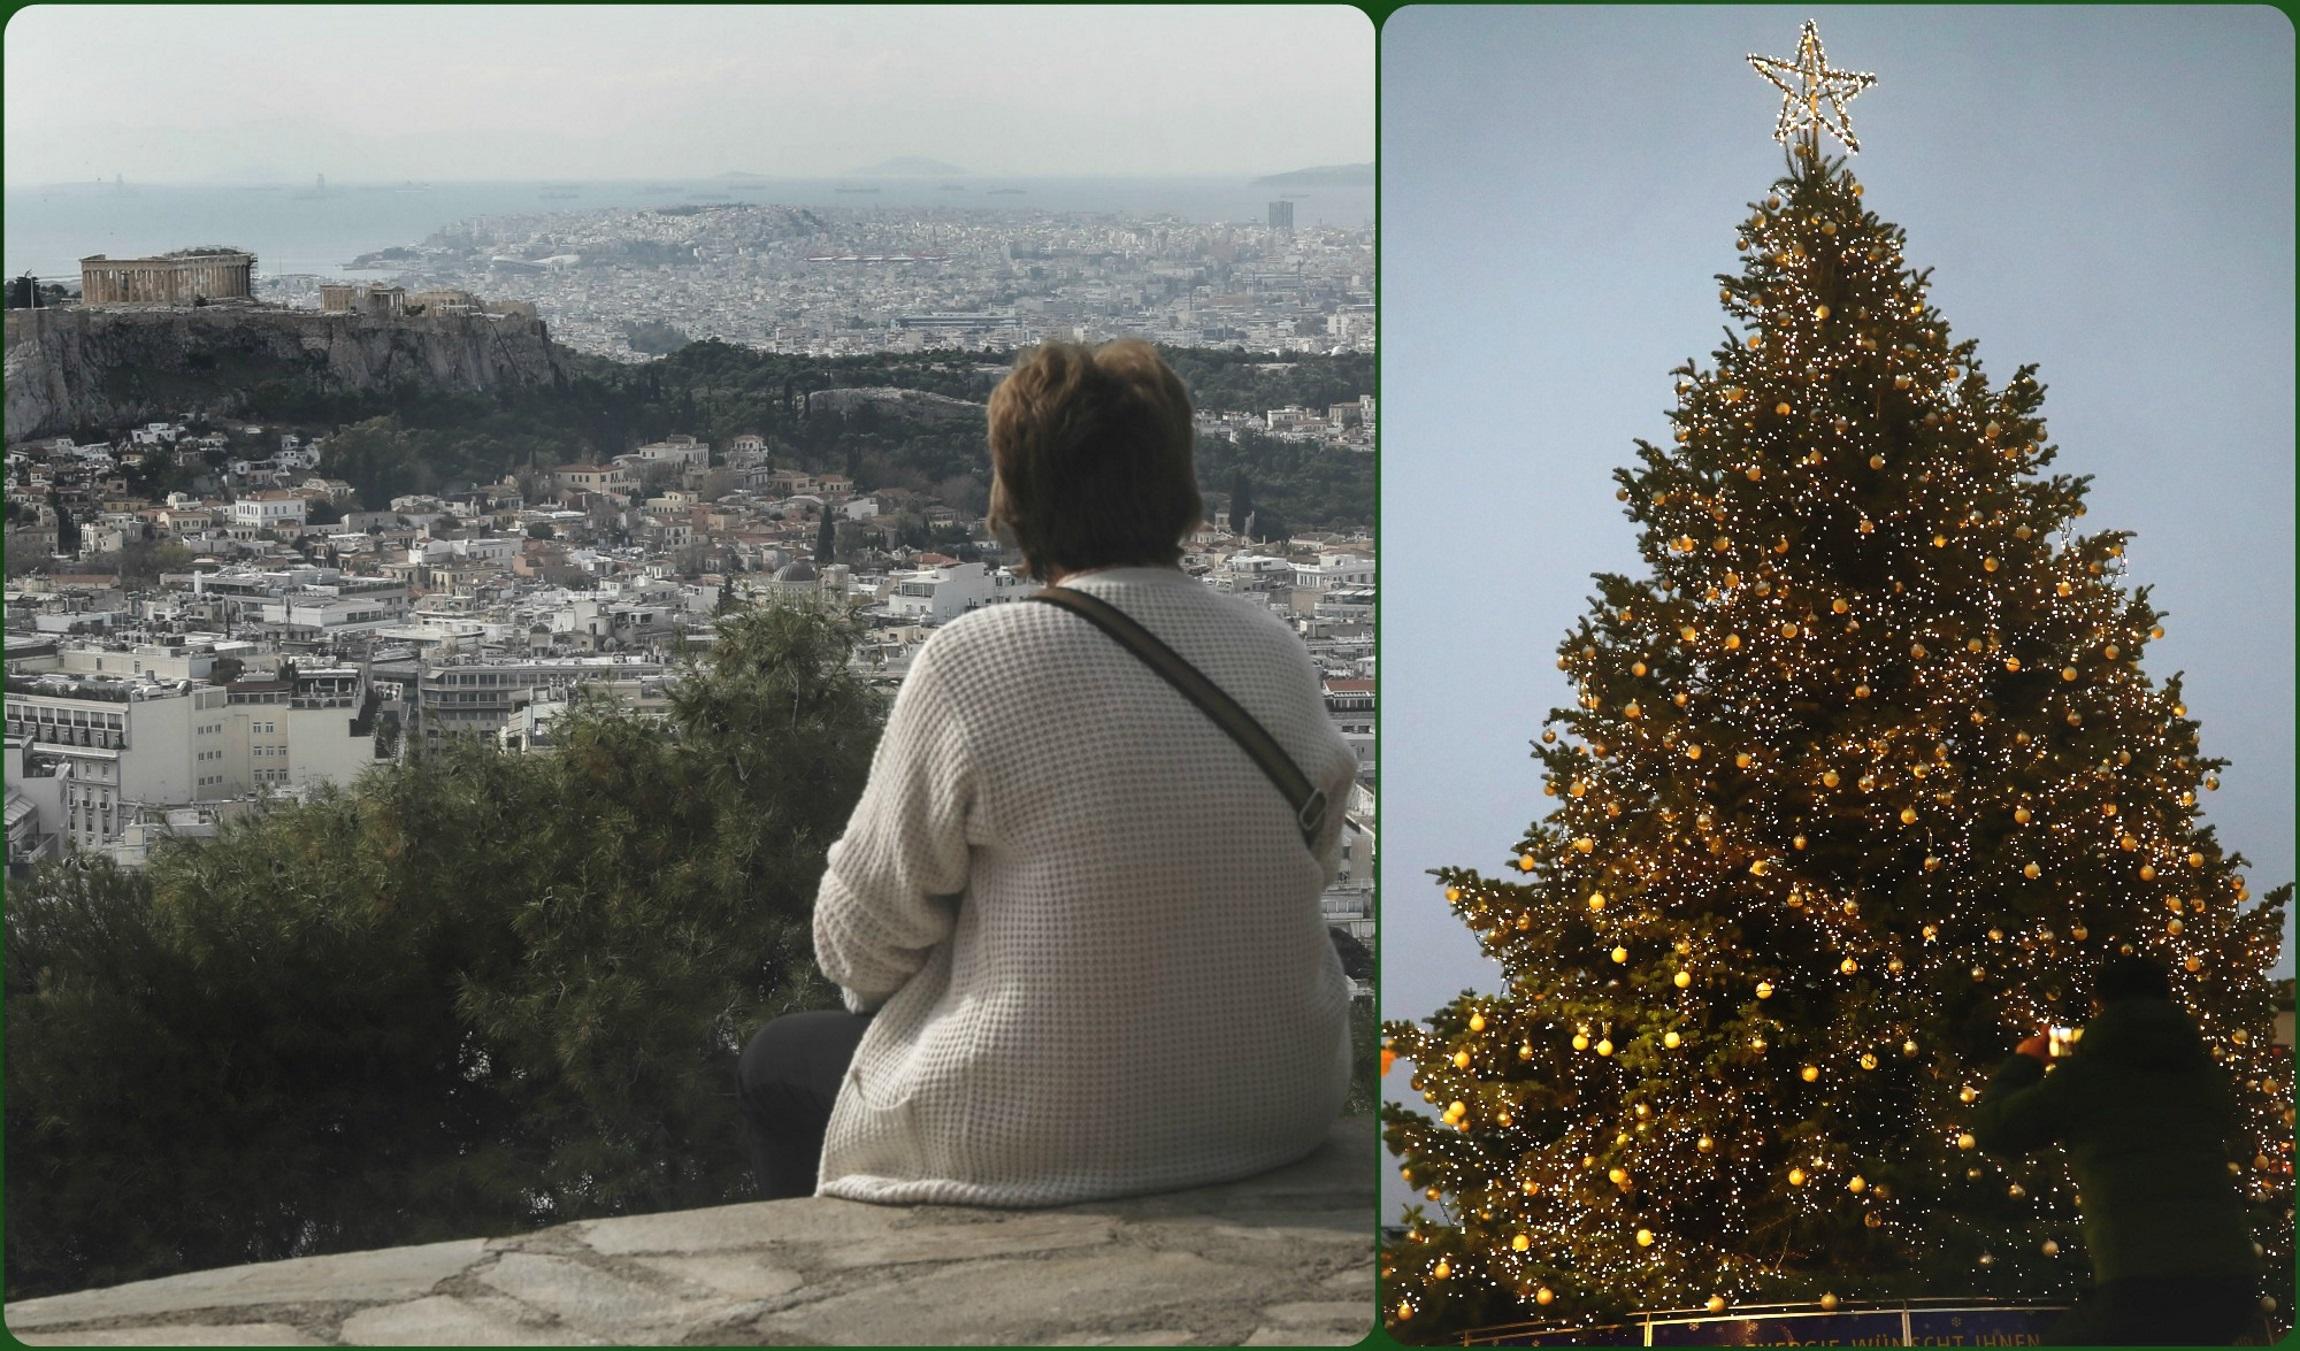 Lockdown: Με το… κυάλι ο στόχος για να «ανοίξουμε» τα Χριστούγεννα!